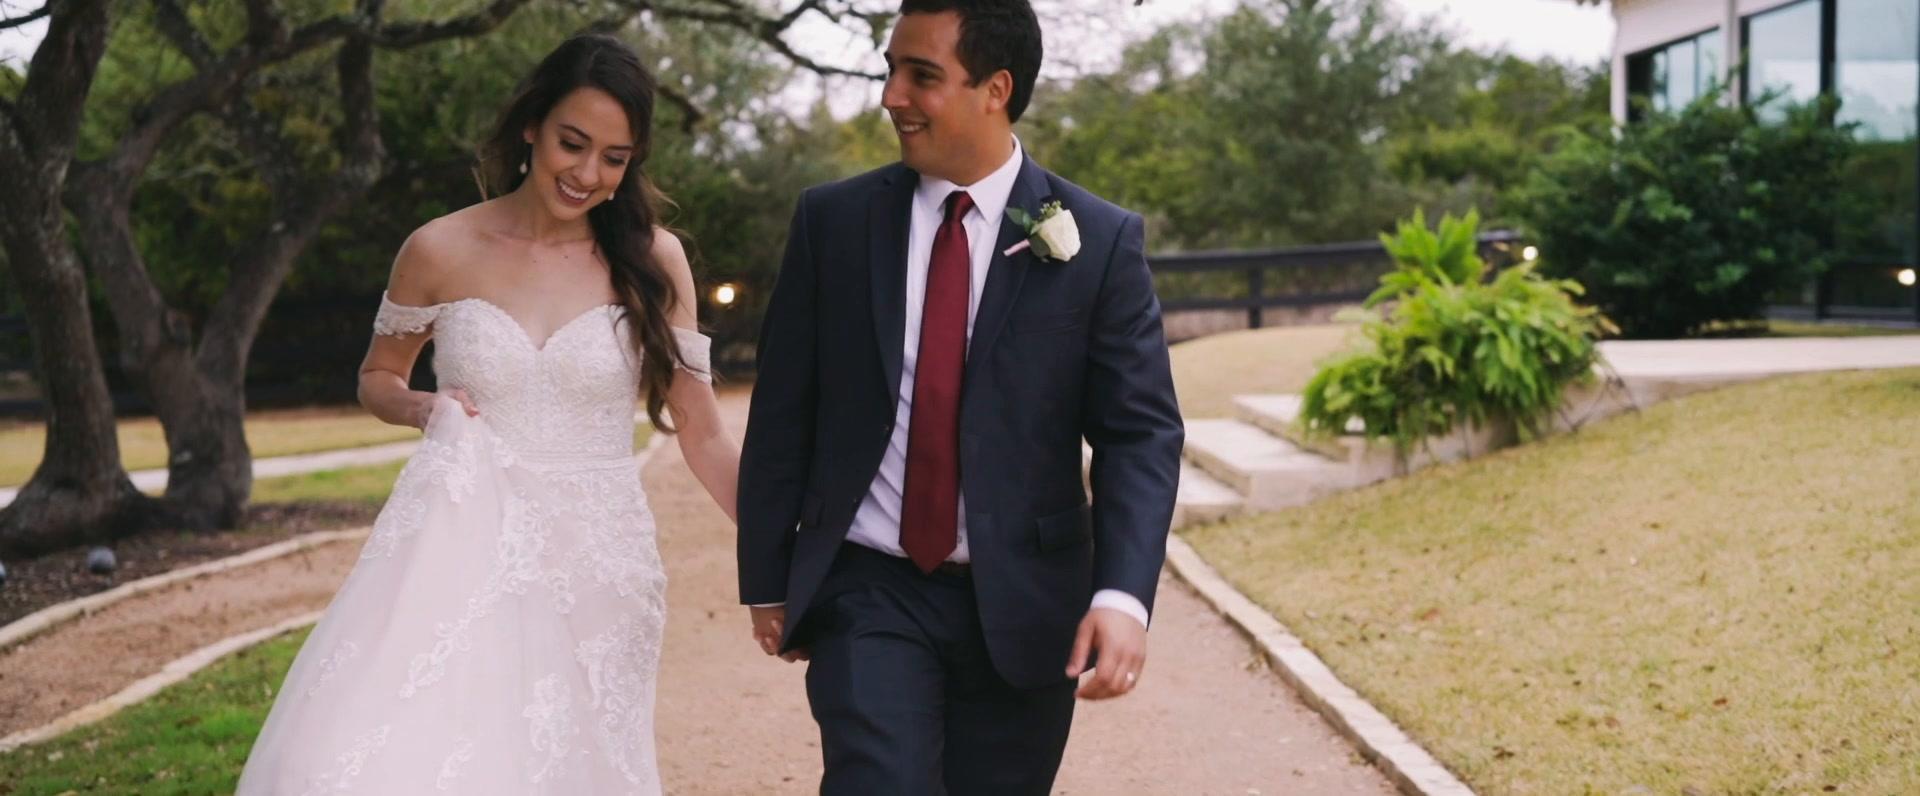 Ellen + Gabriel | Austin, Texas | antebellum oaks